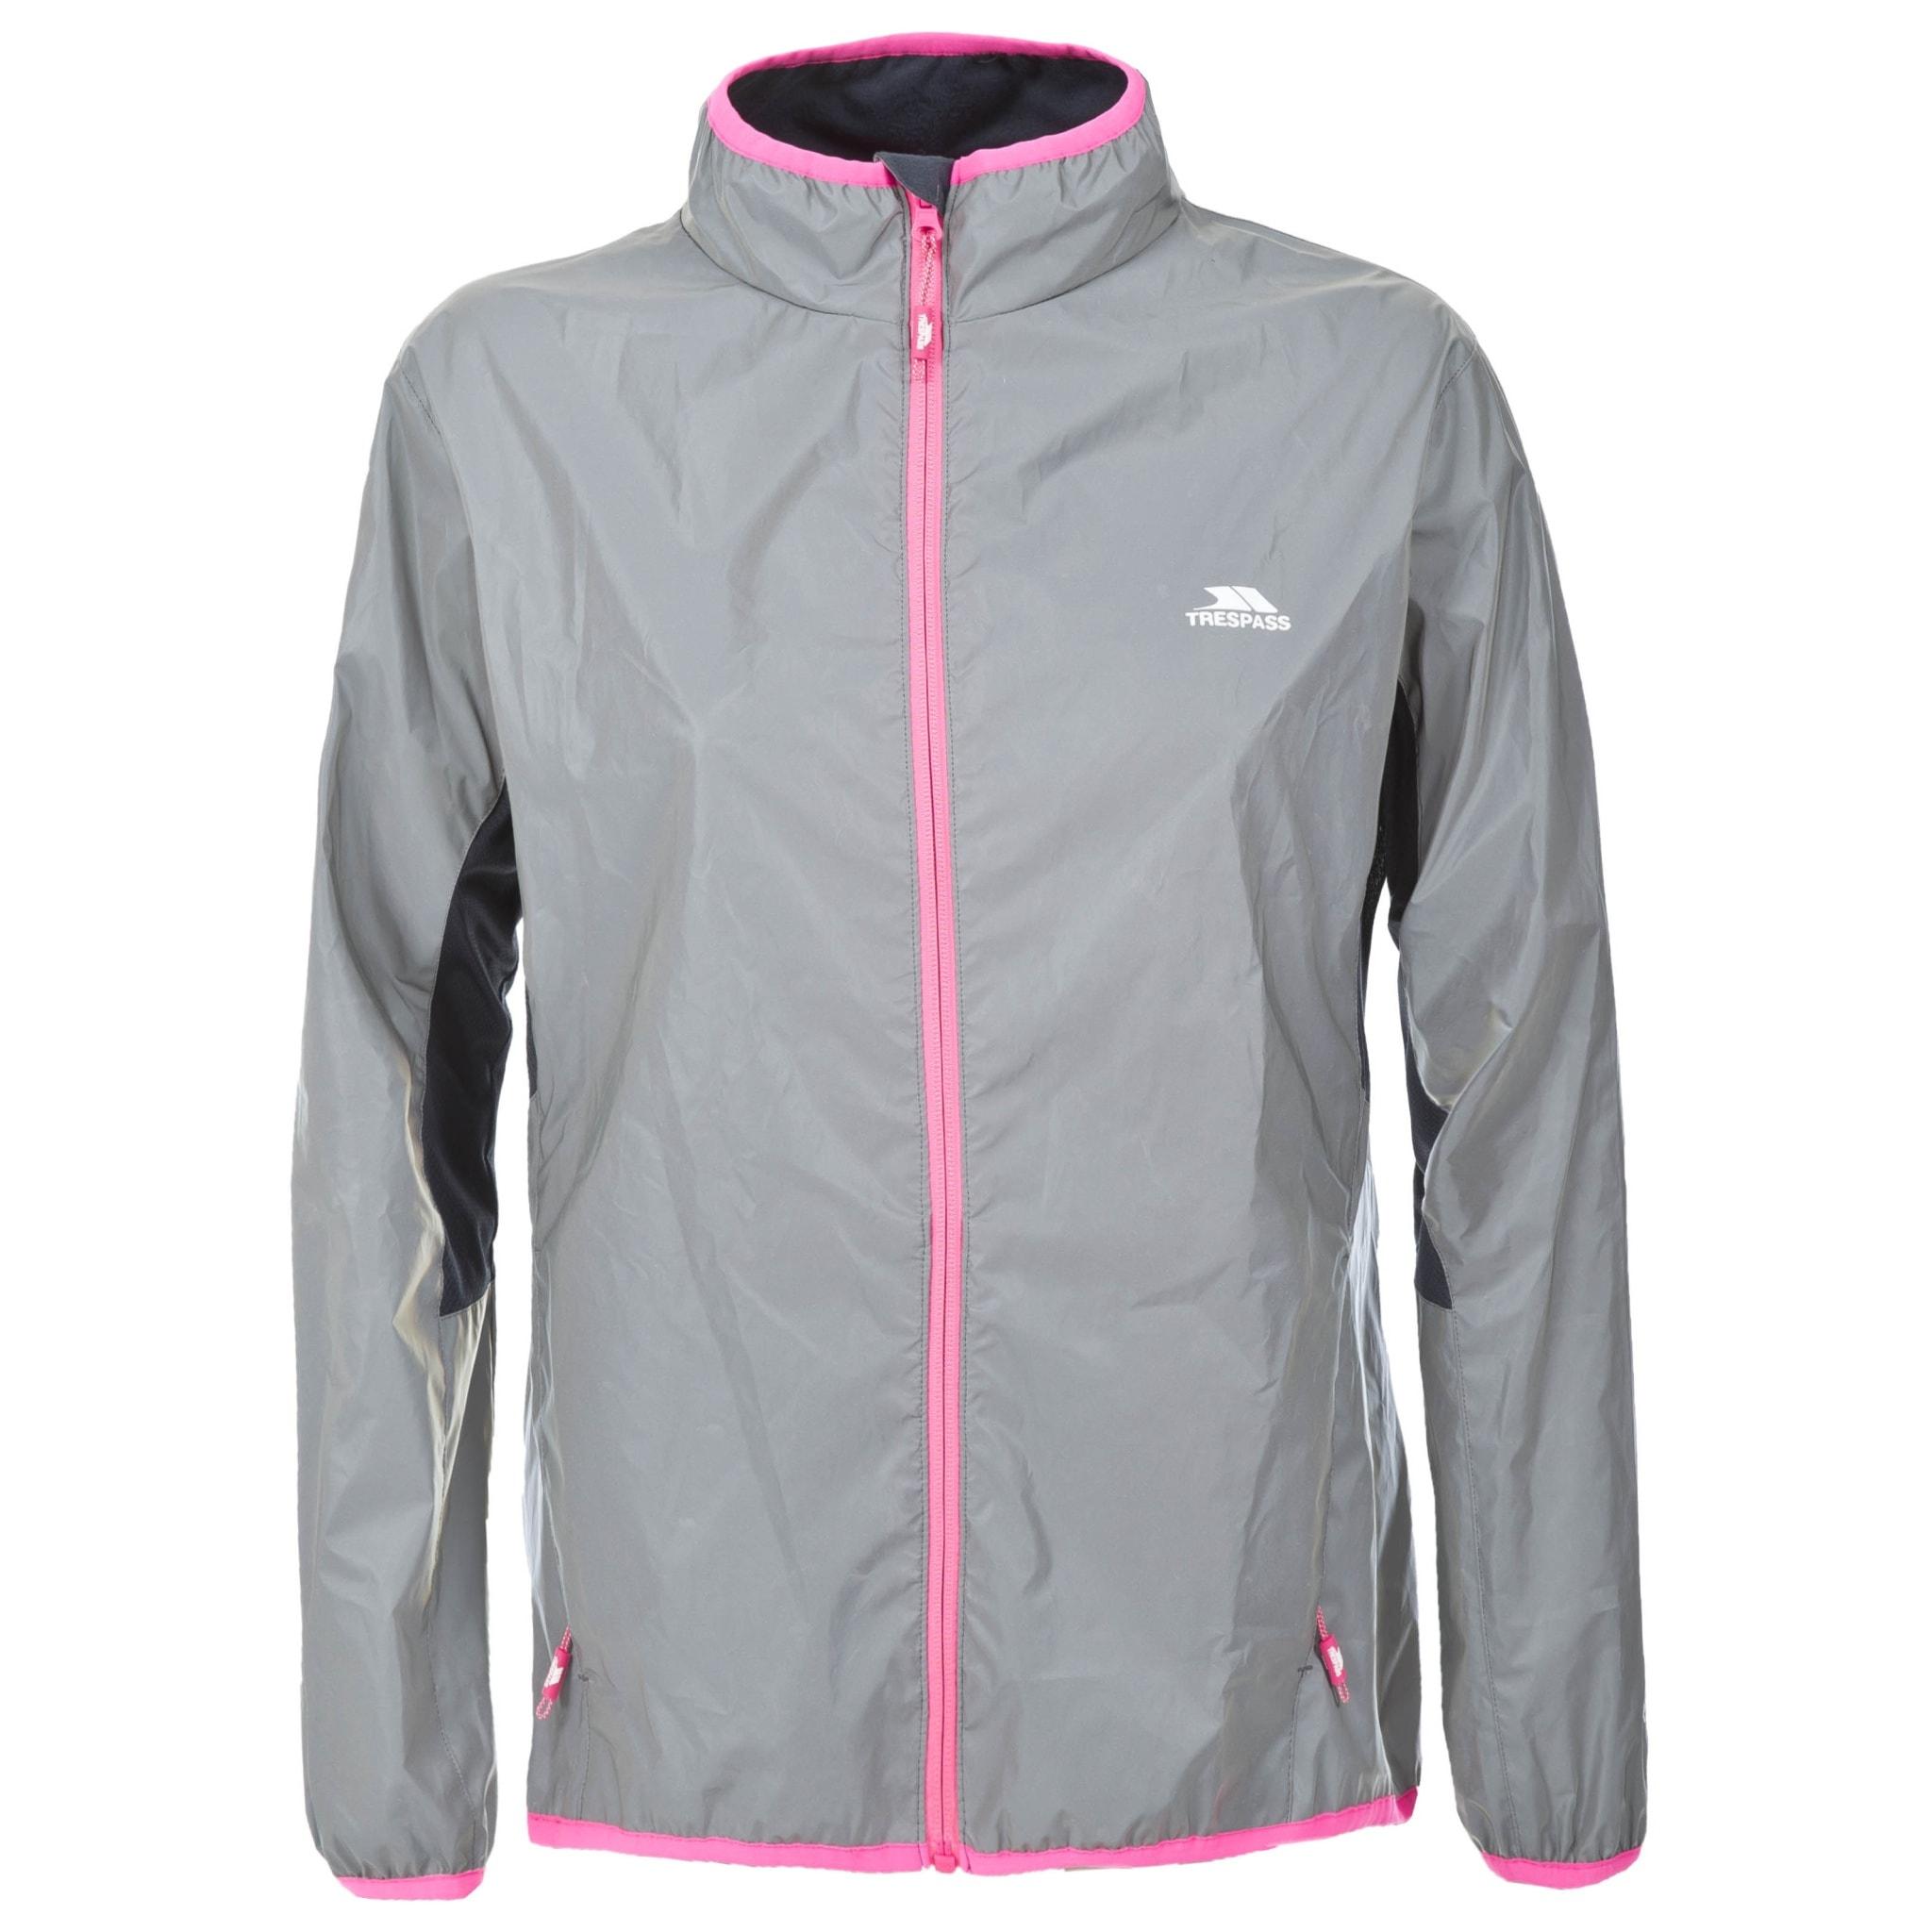 Trespass Funktionsjacke Damen Lumi Aktiv-Jacke reflektierendes Material